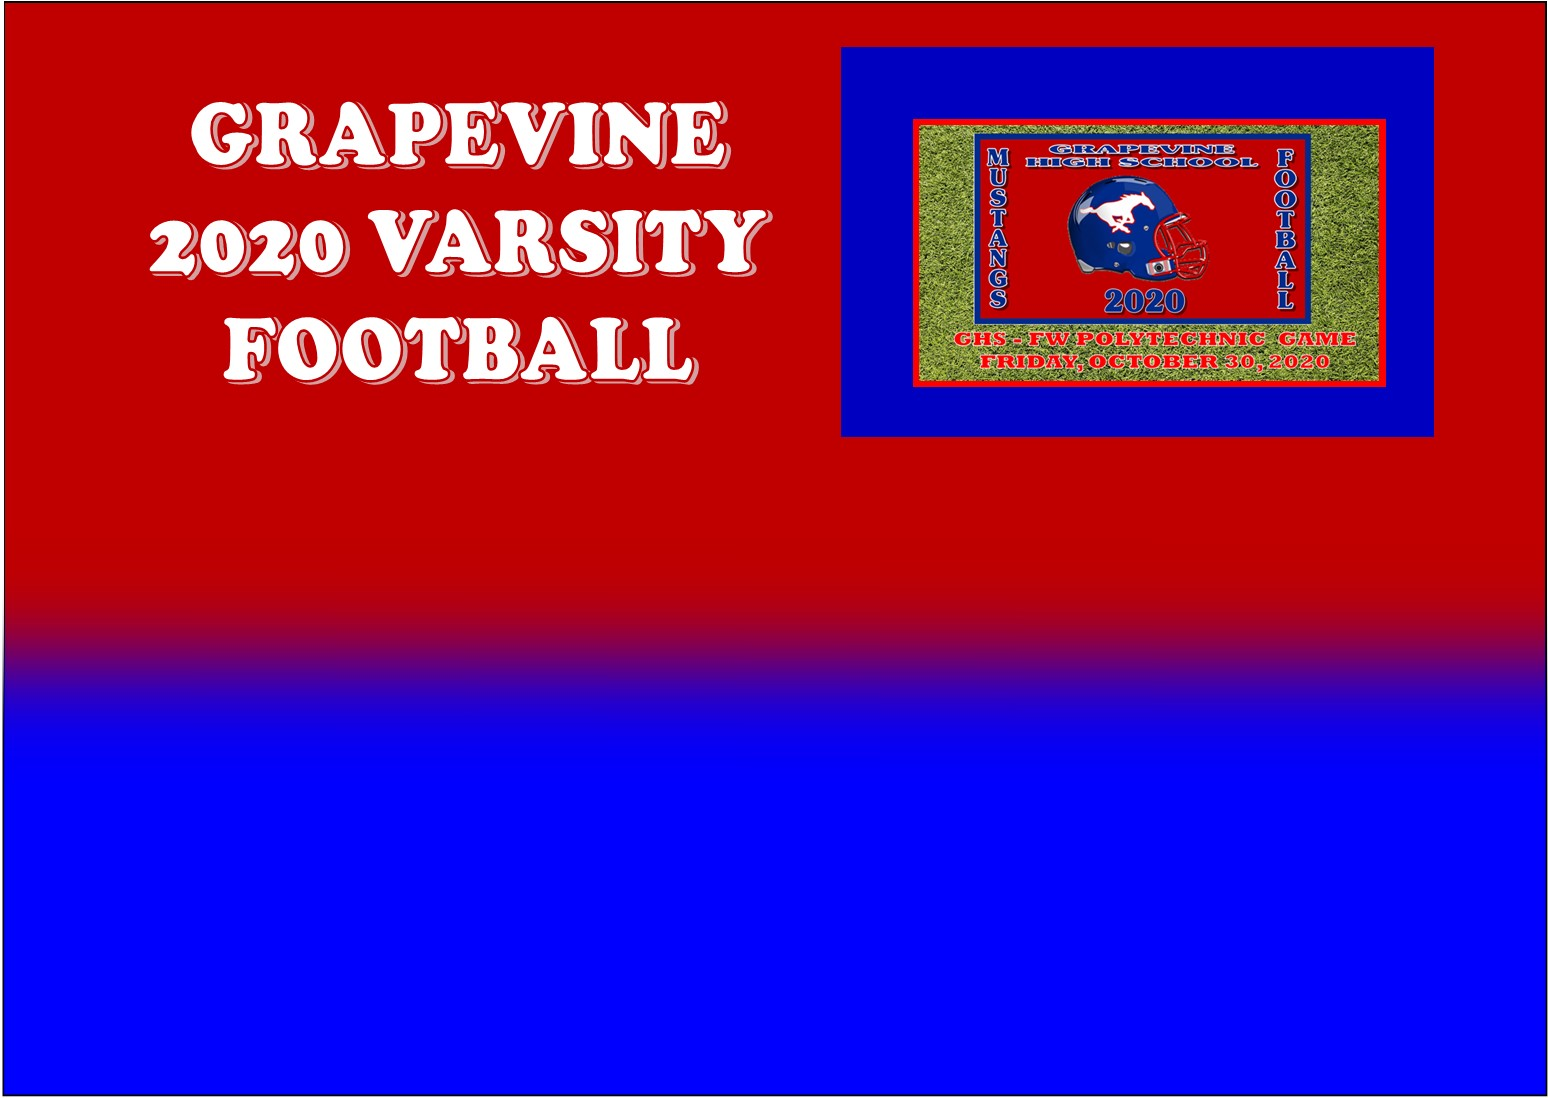 GCISD Football:  Grapevine Mustangs Hammer Fort Worth Polytechnic Parrots 42-9